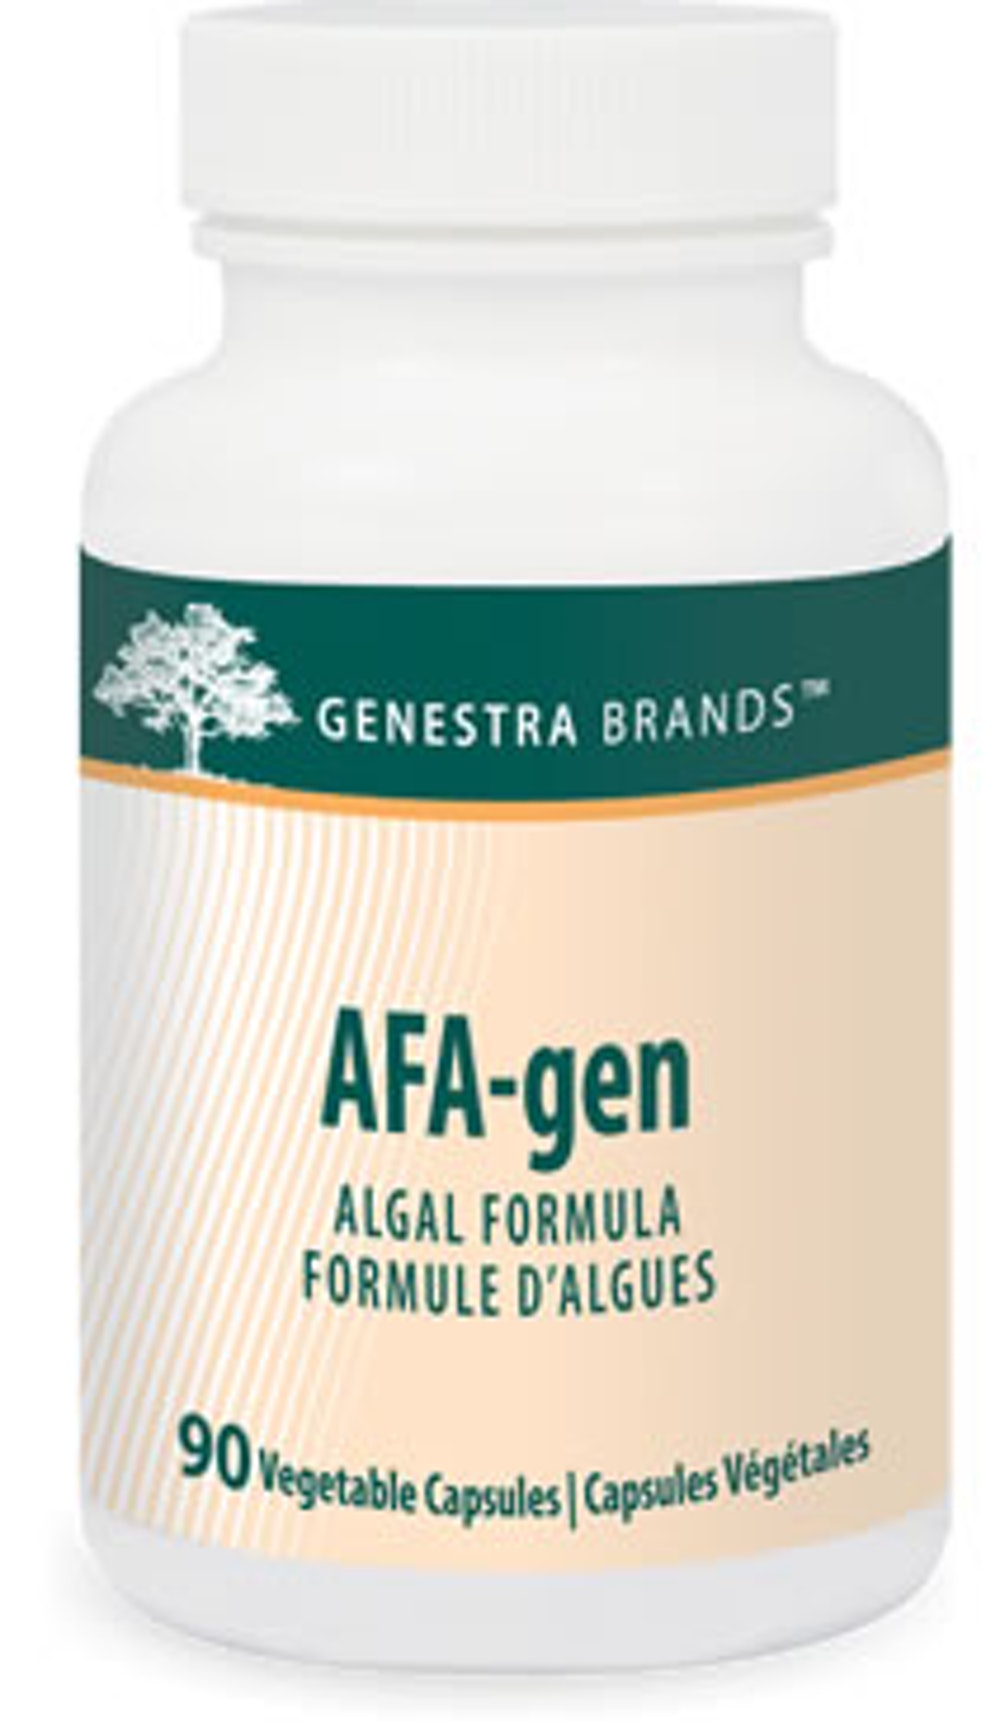 AFA-gen